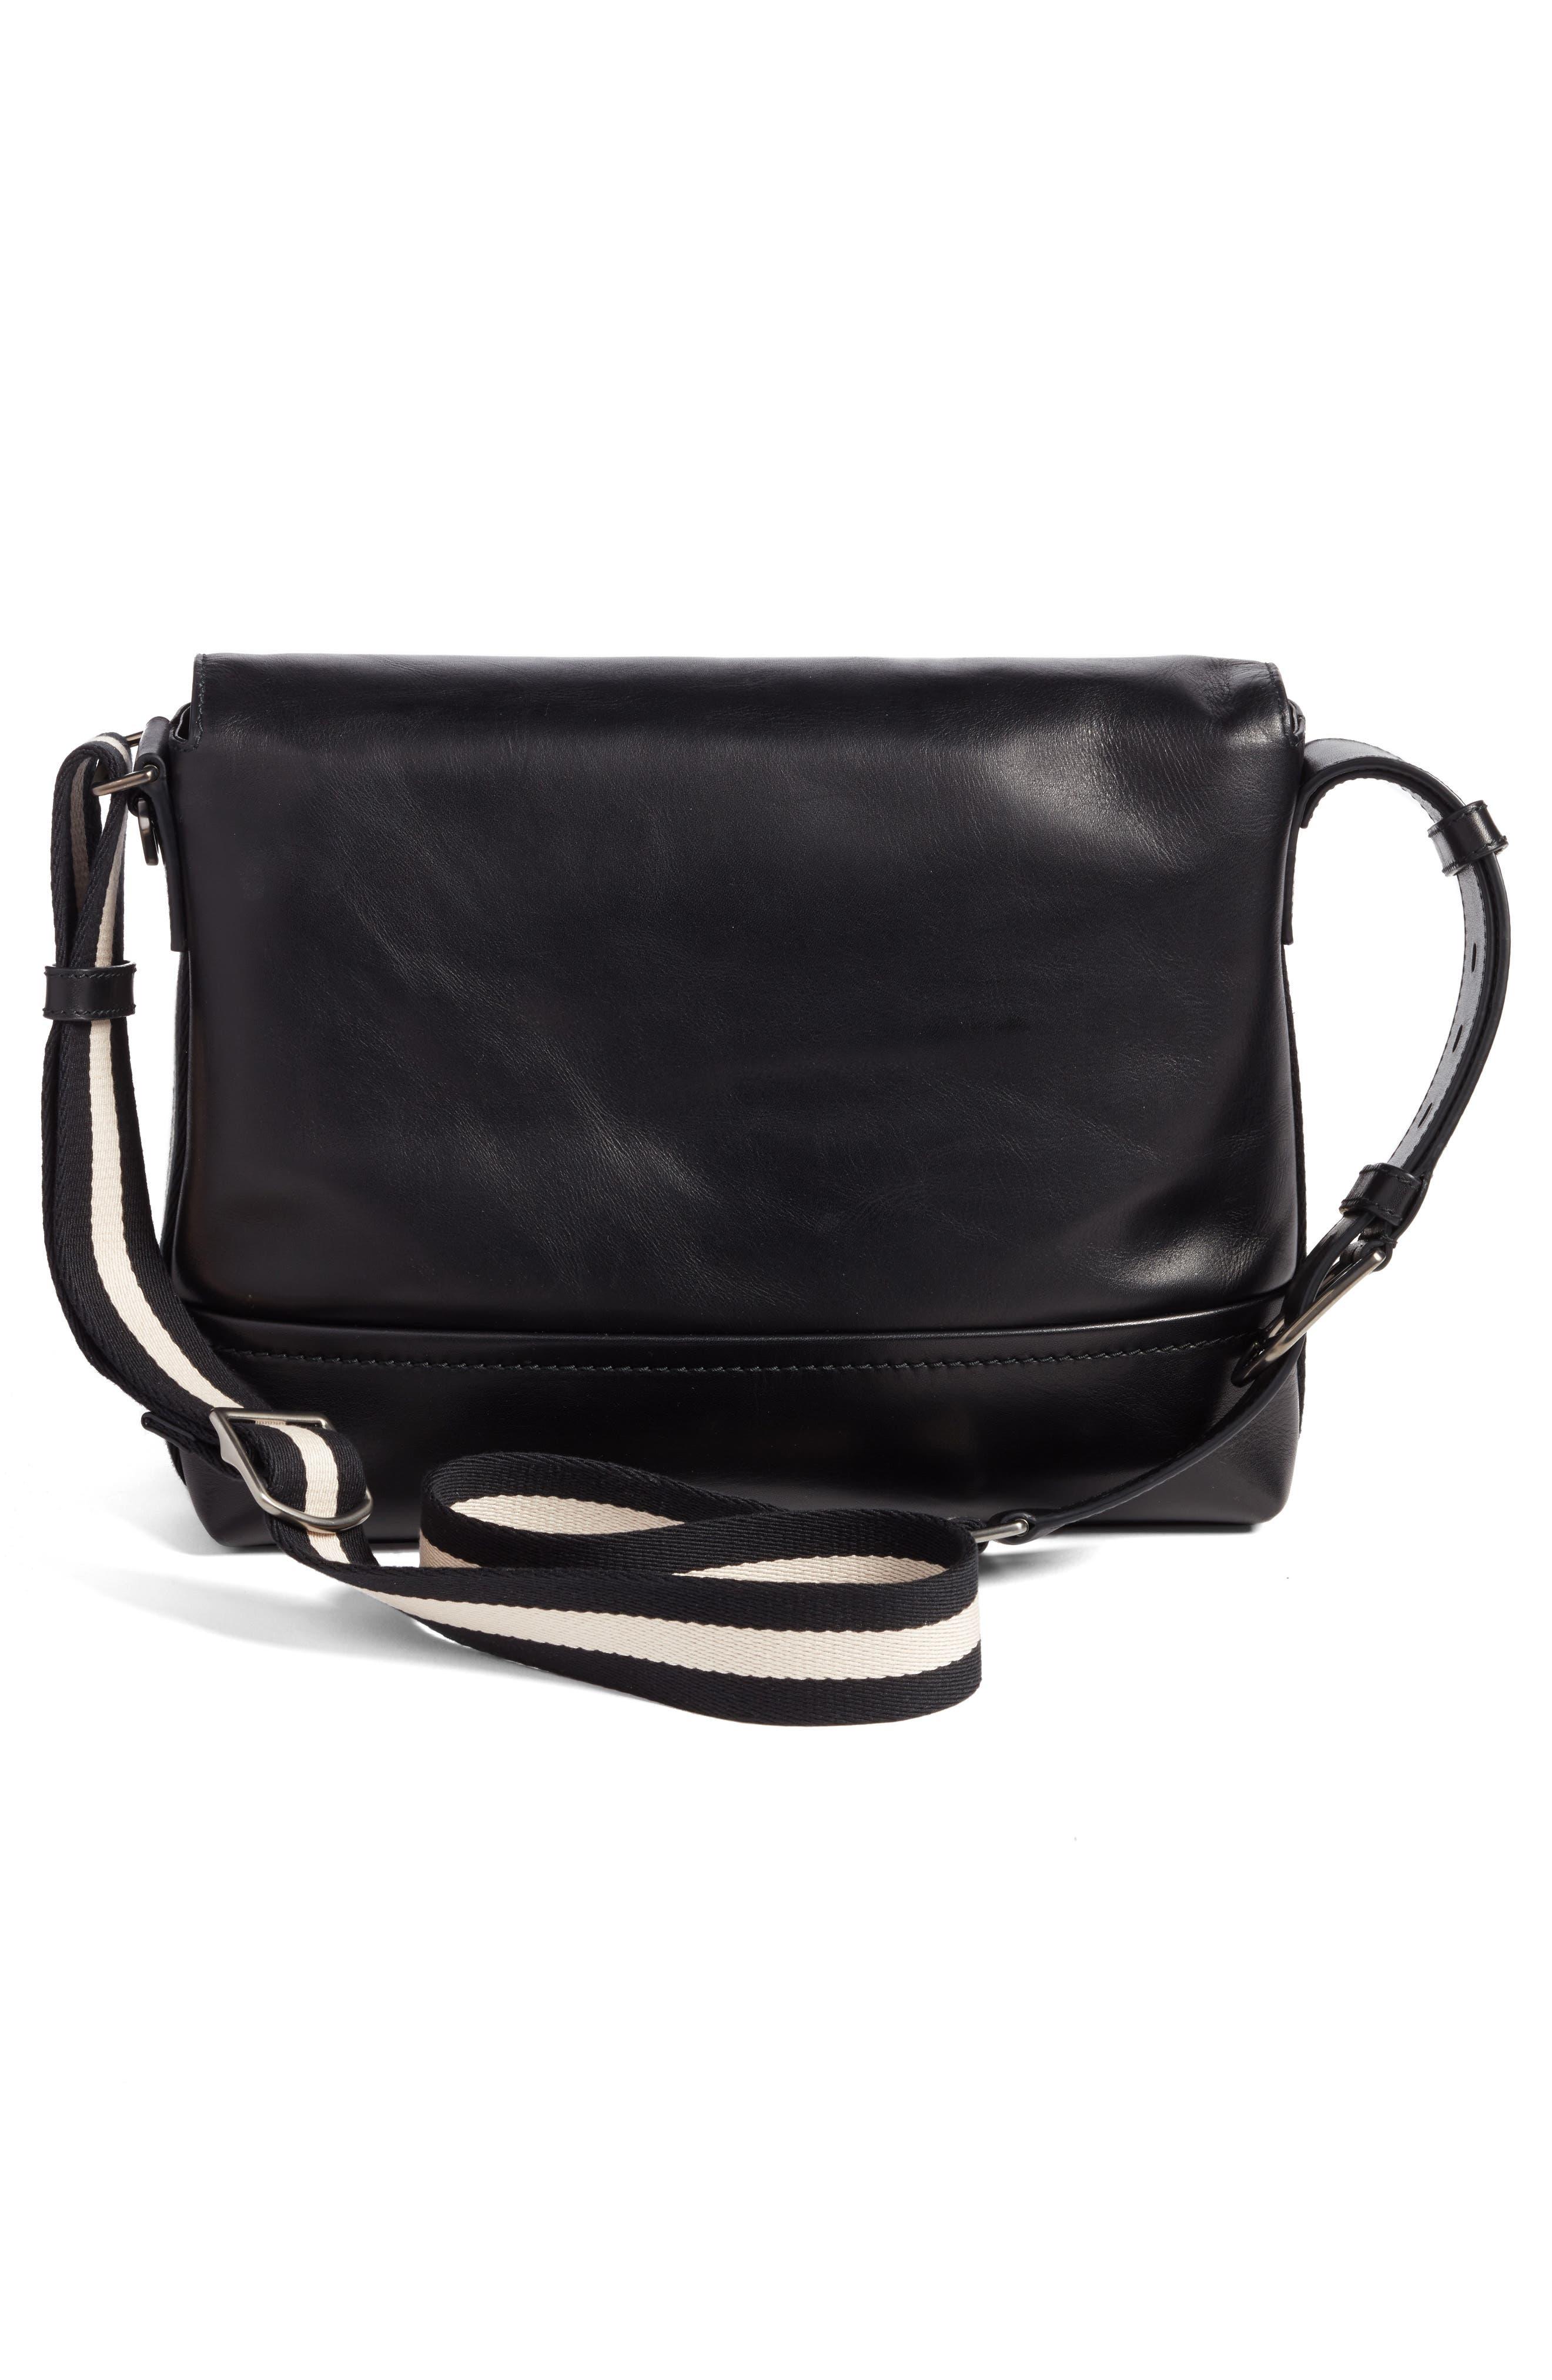 Tamrac Leather Messenger Bag,                             Alternate thumbnail 3, color,                             001